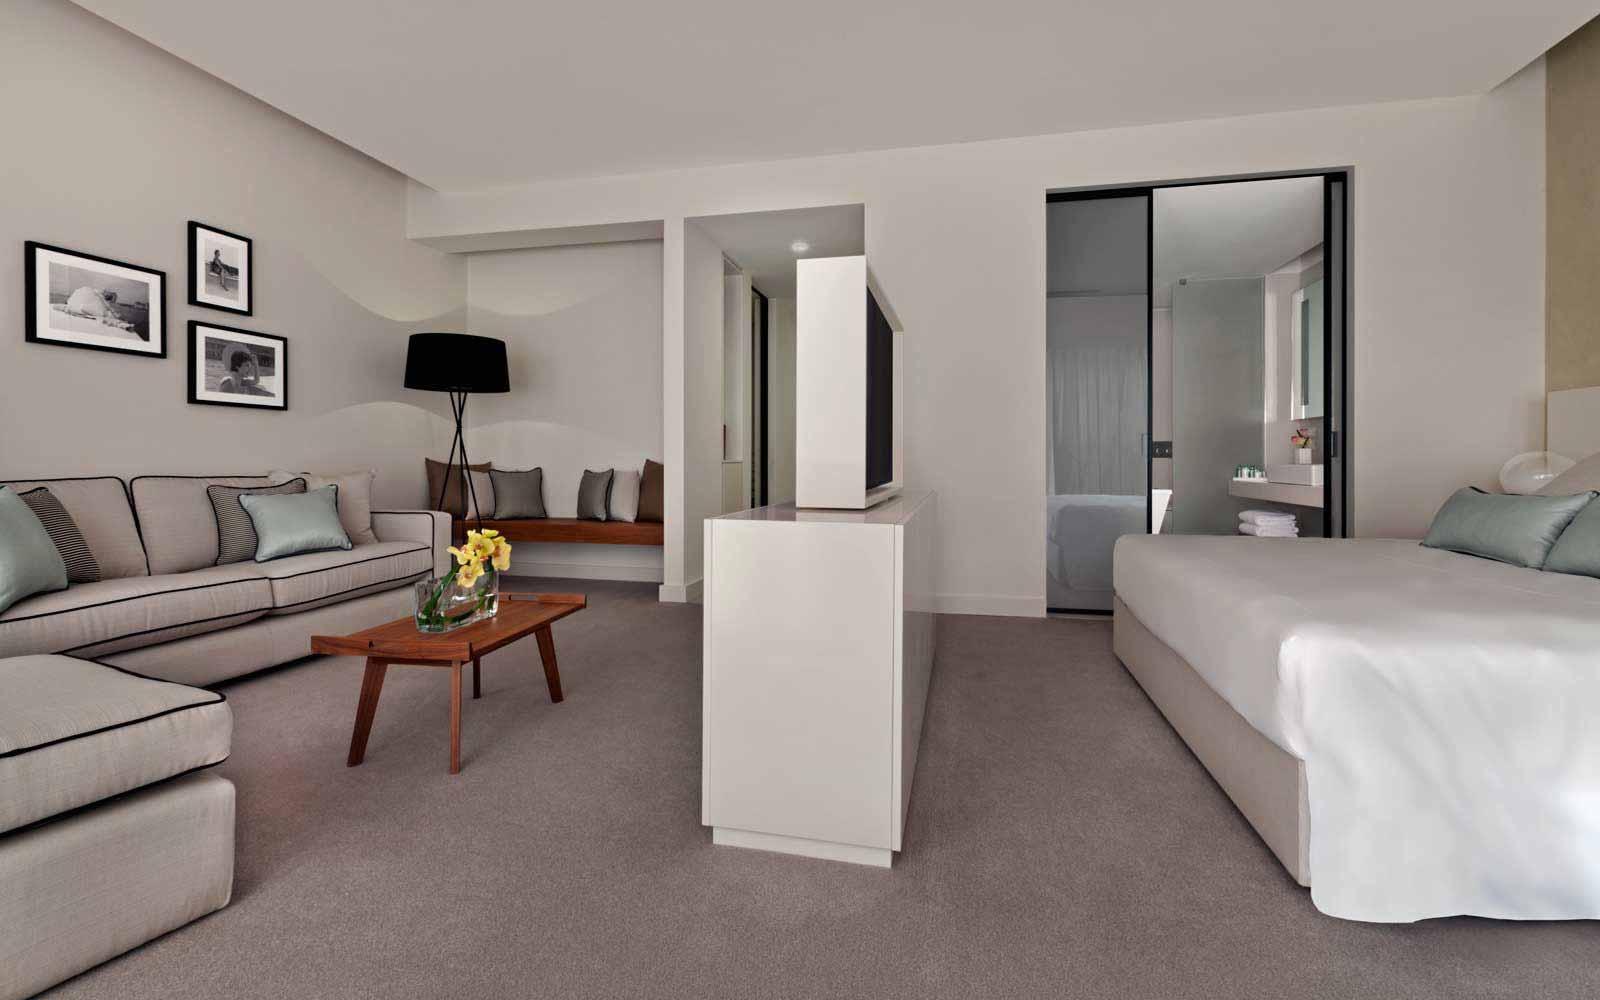 Junior Suite at the JW Marriott Venice Resort & Spa